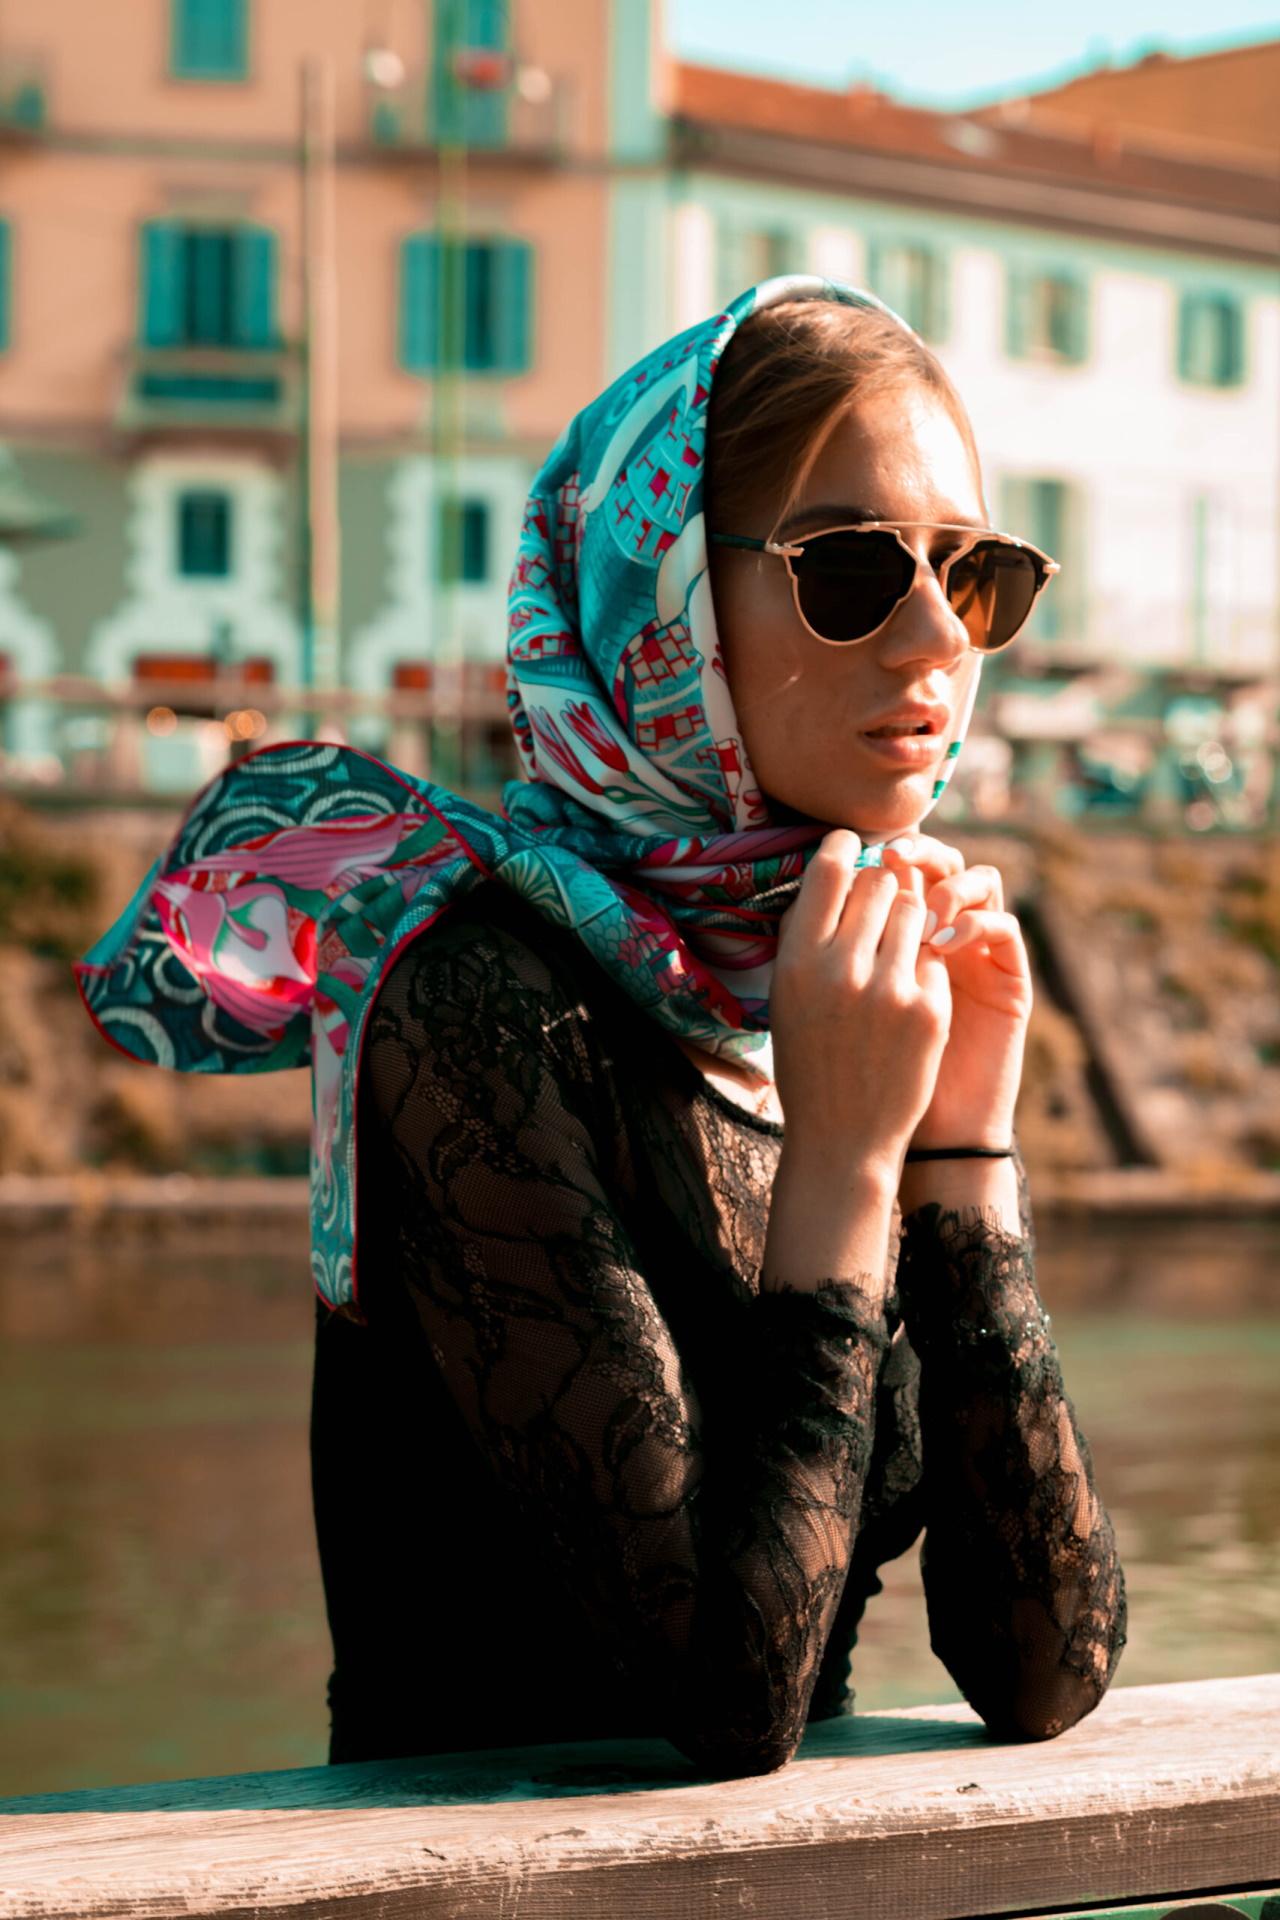 FOULARD H FOULARD SCIARPA DONNA 100 SETA 90CMX90CM 4 1stAmerican foulard/sciarpa 100% seta da donna 90cmx90cm